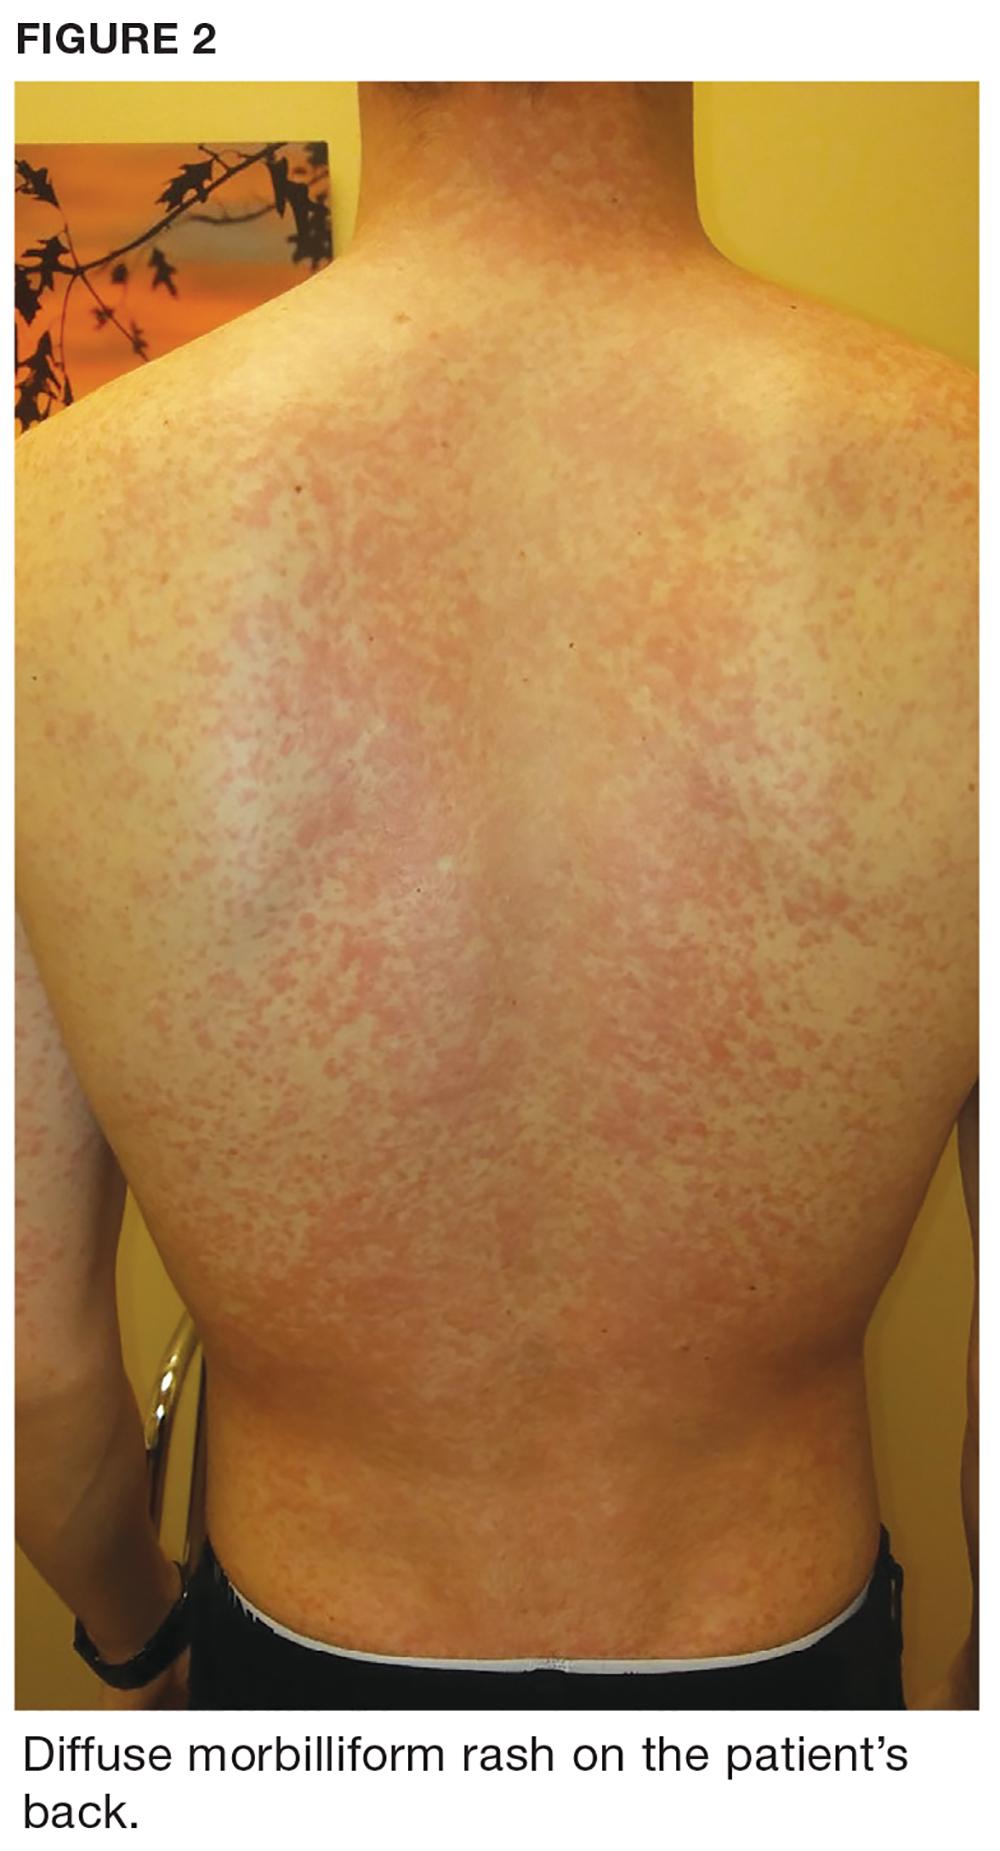 Diffuse morbiliform rash on the patient's back.